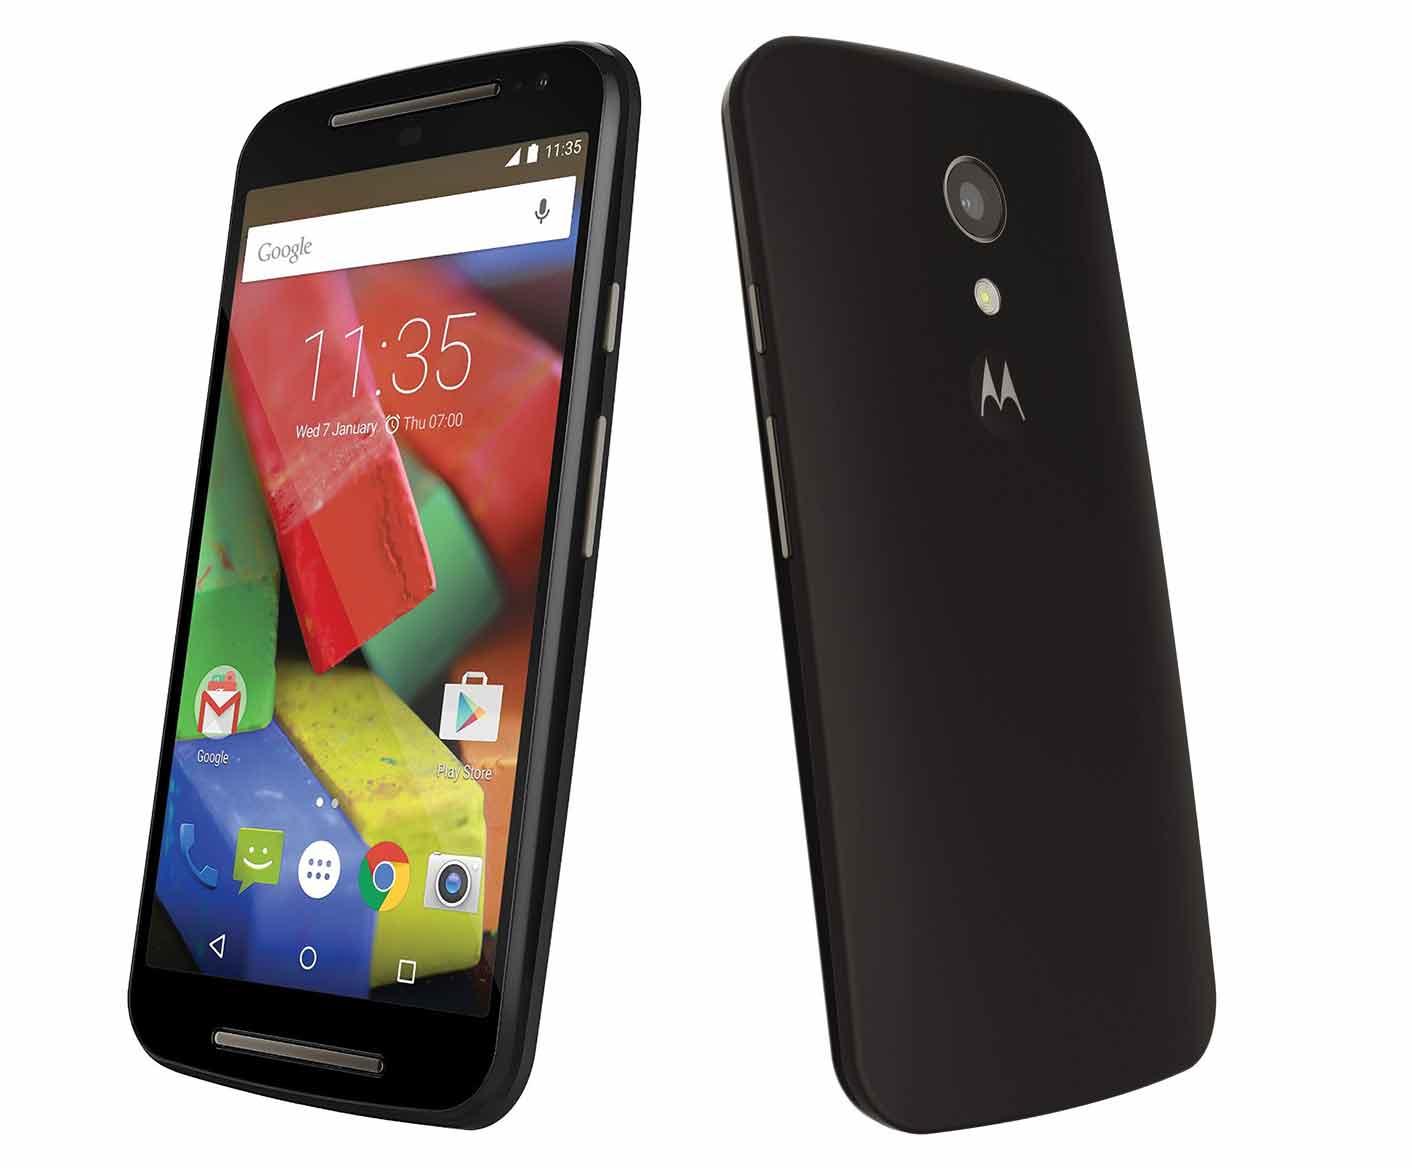 4a306deeb9 Motorola Moto G 4G 2nd Gen G2 XT1072 Price Review Specifications ...